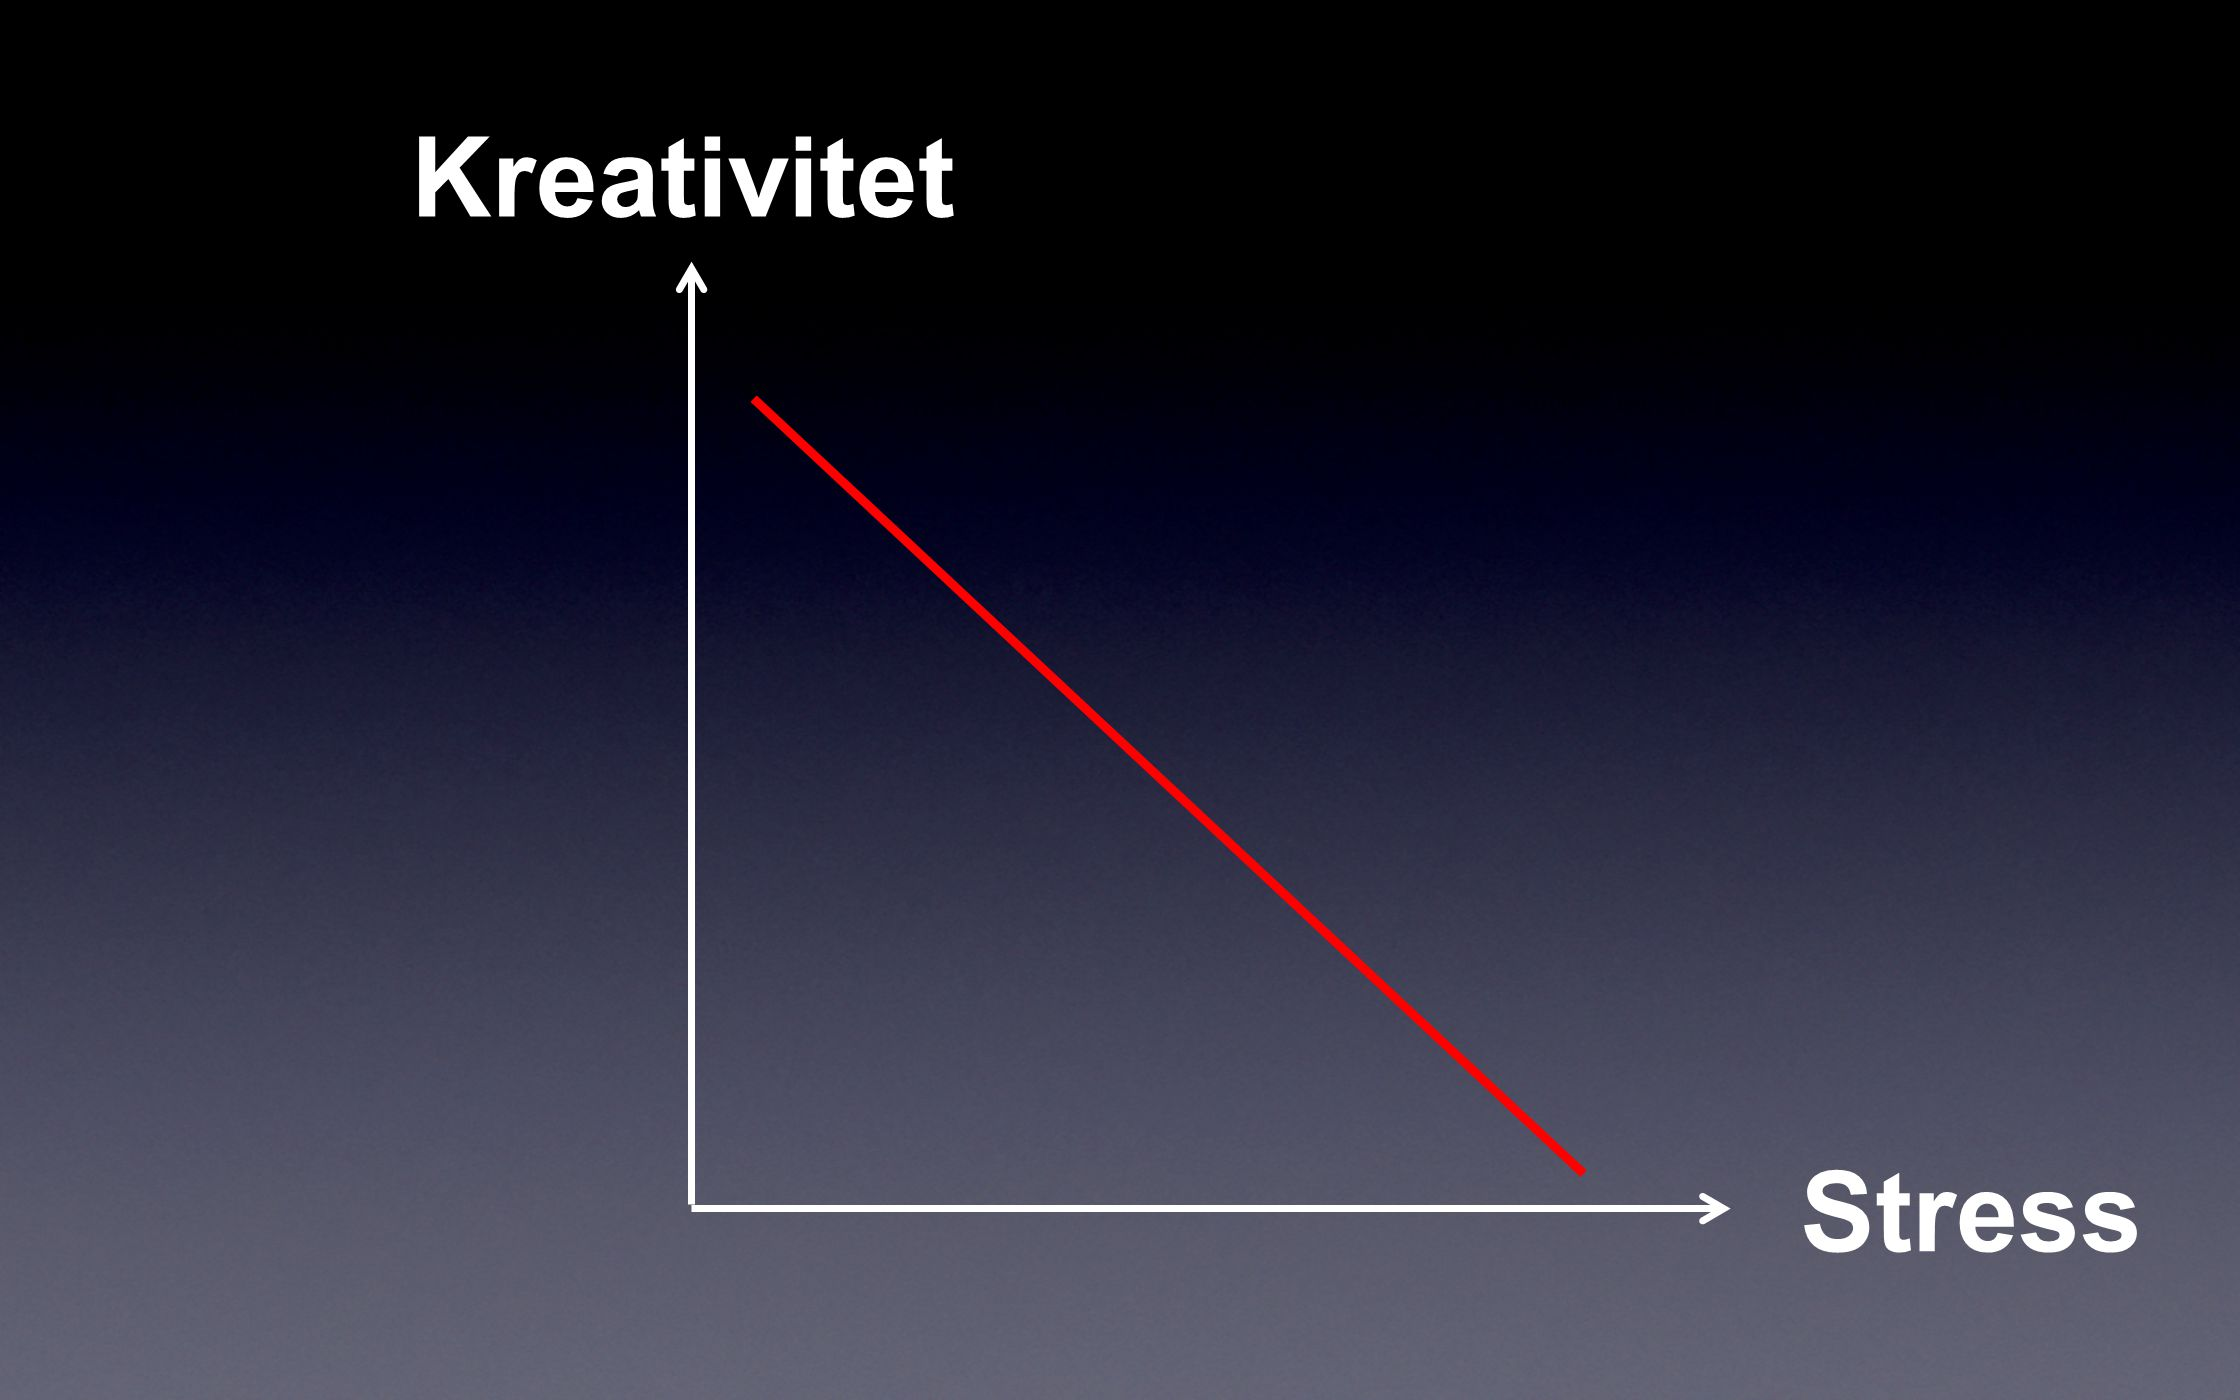 Kreativitet Stress